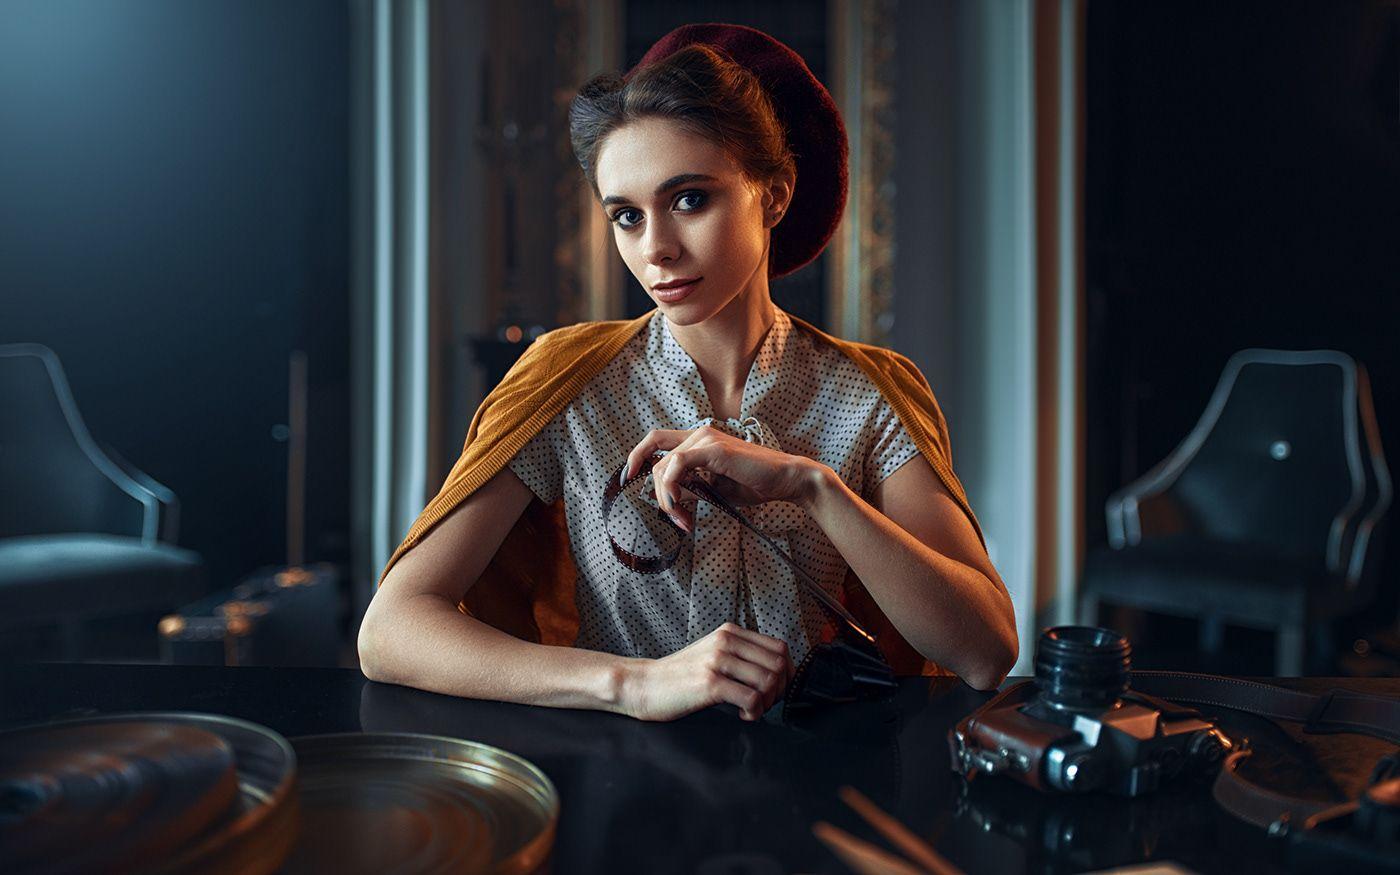 fashion photography retro styled by maks kuzin